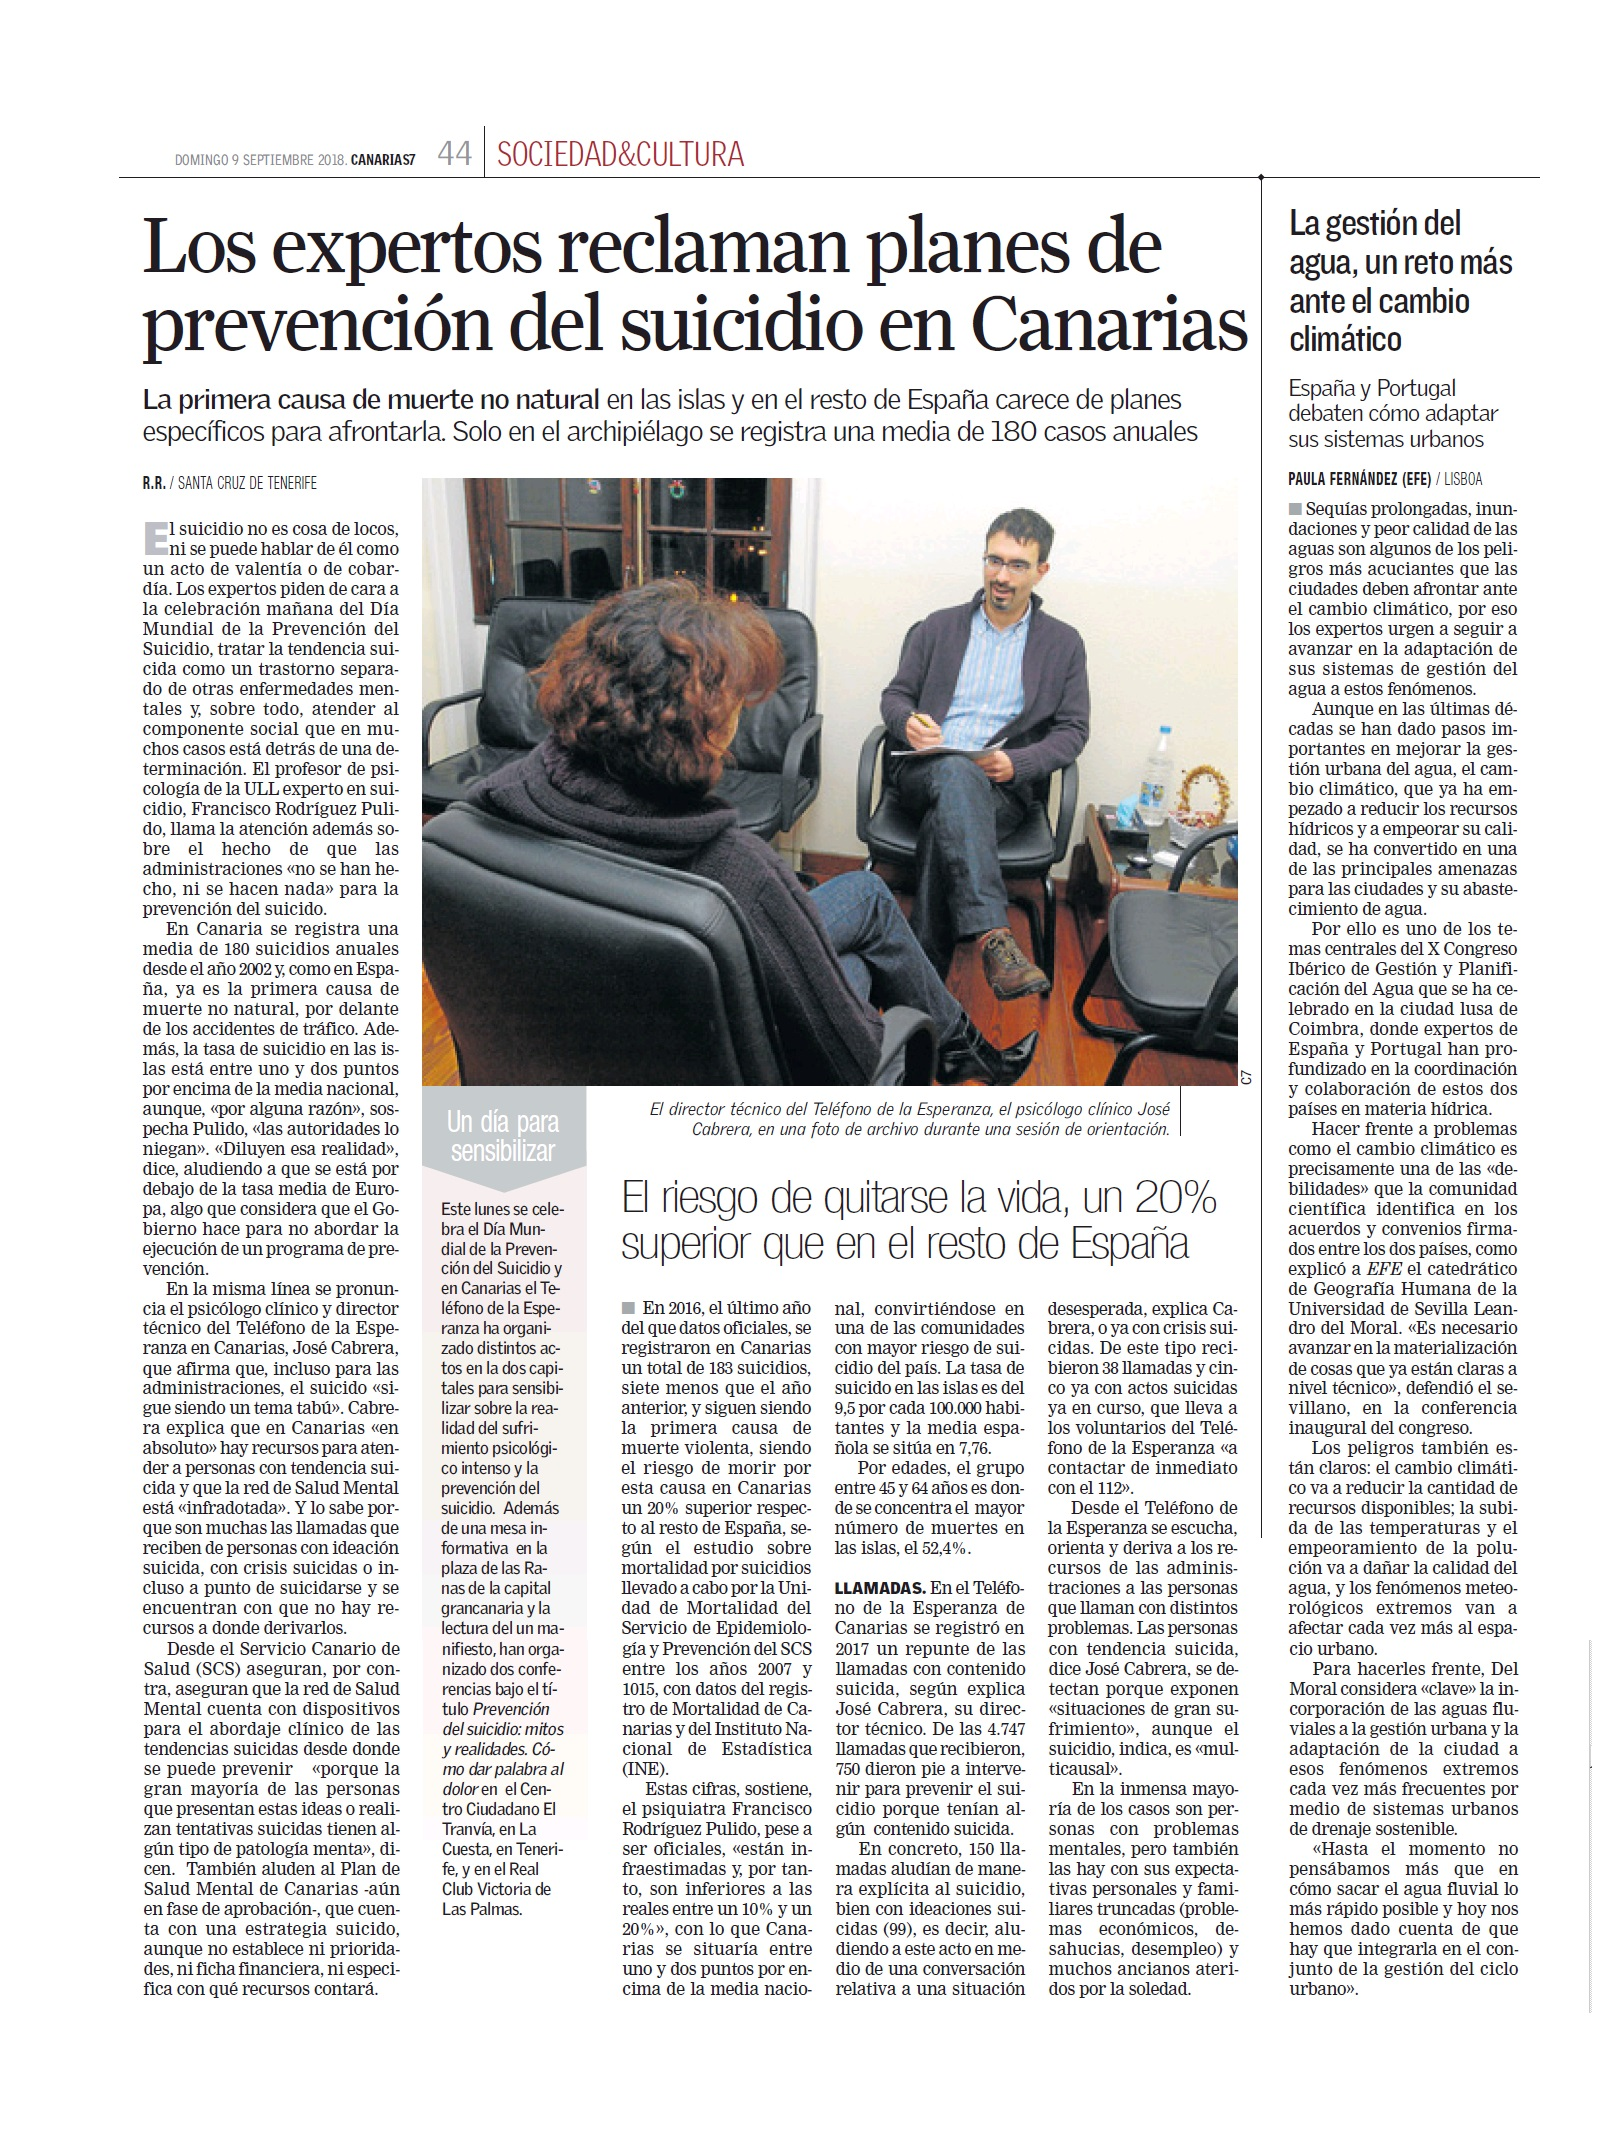 ARTICULO T.E. - DIA PREV SUICIDIO CANARIAS7 9.9.2018